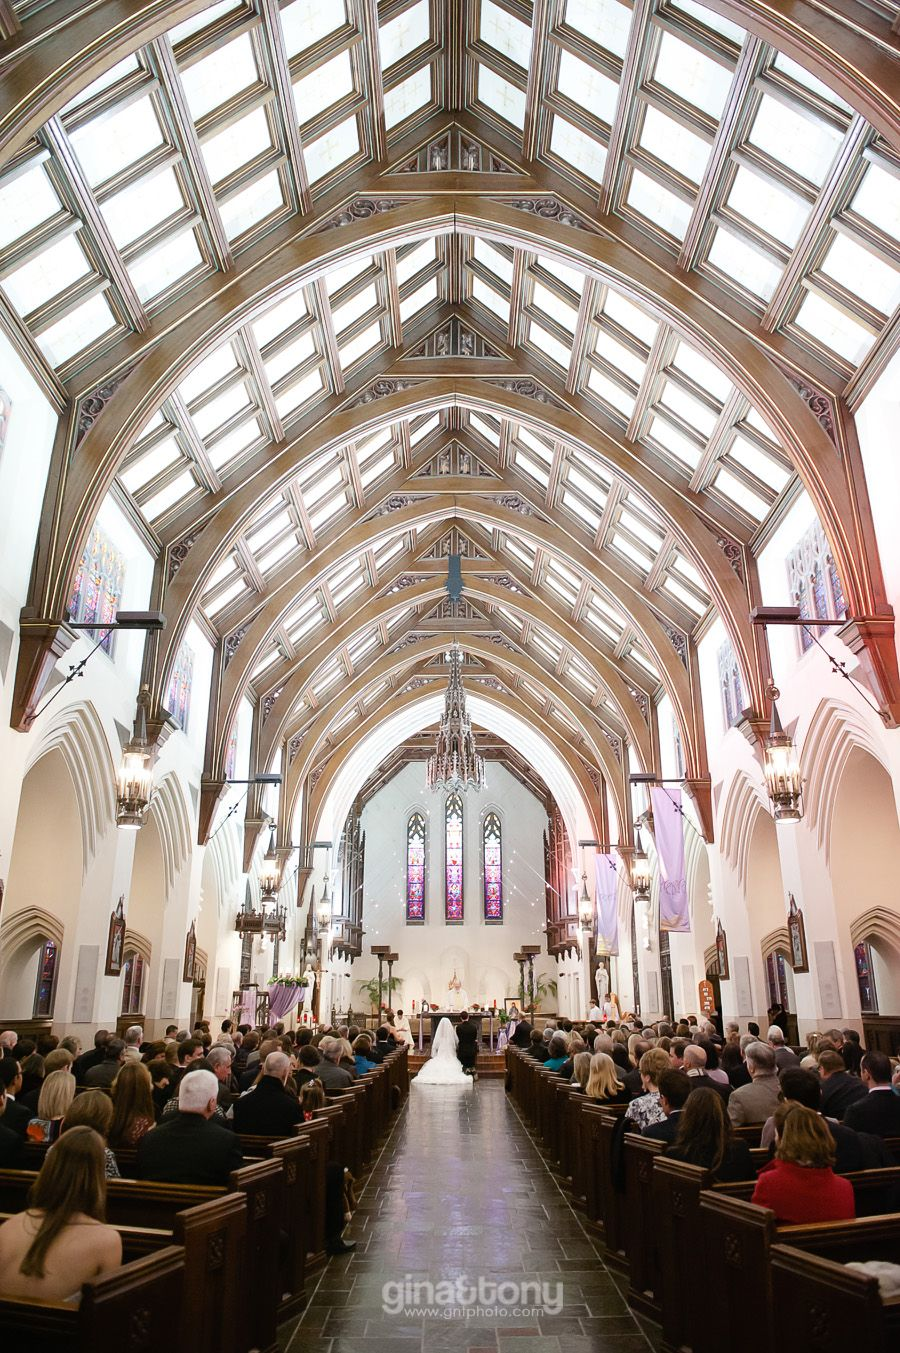 regina&julian | Chicago wedding venues, Illinois wedding ...